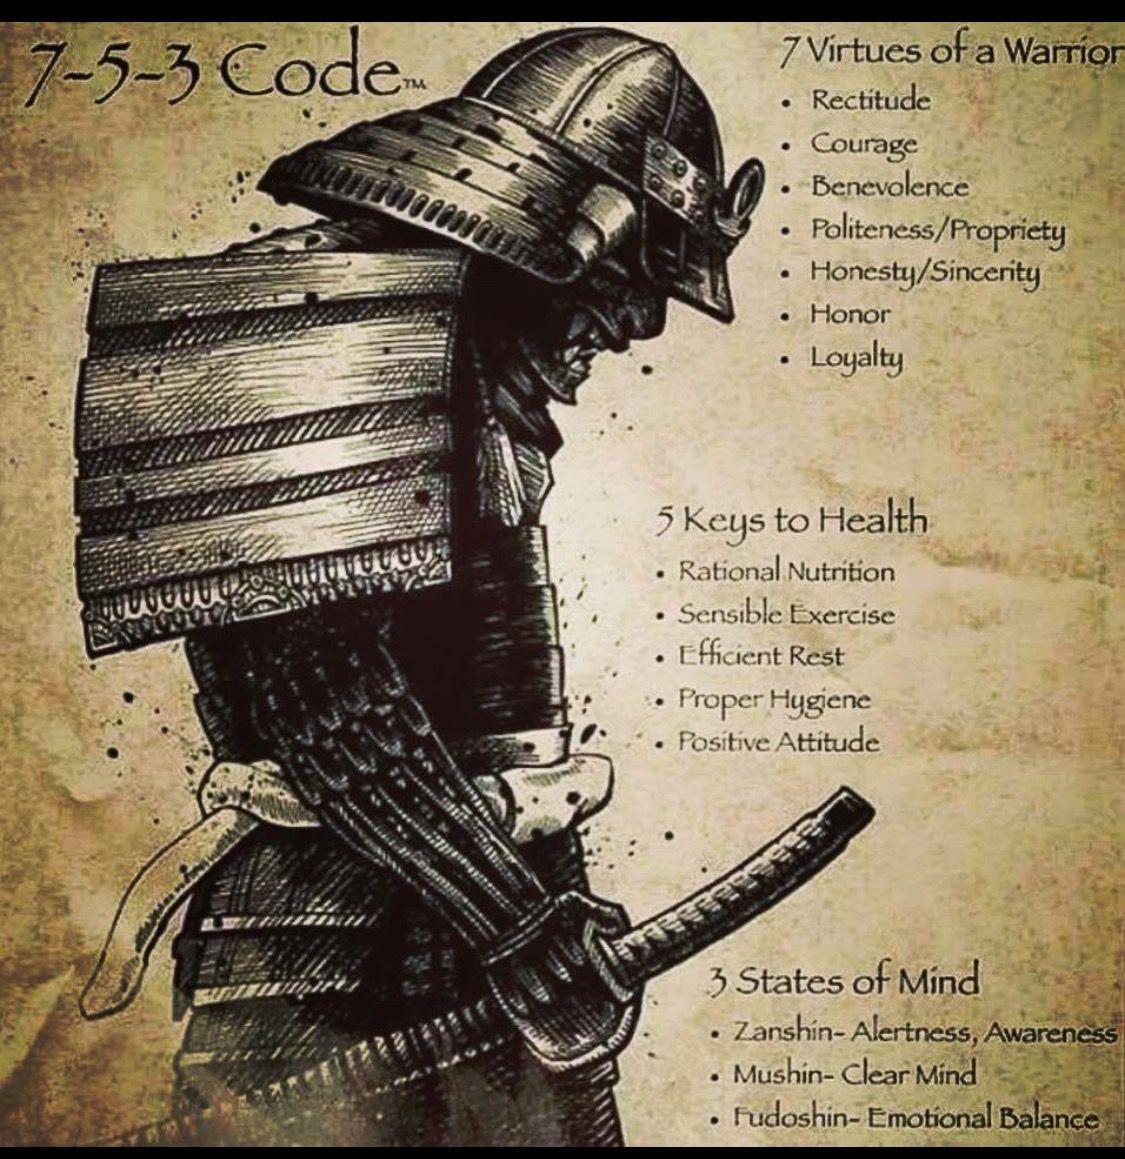 warriors code tattoos pinterest samurai tattoo and tatoo. Black Bedroom Furniture Sets. Home Design Ideas